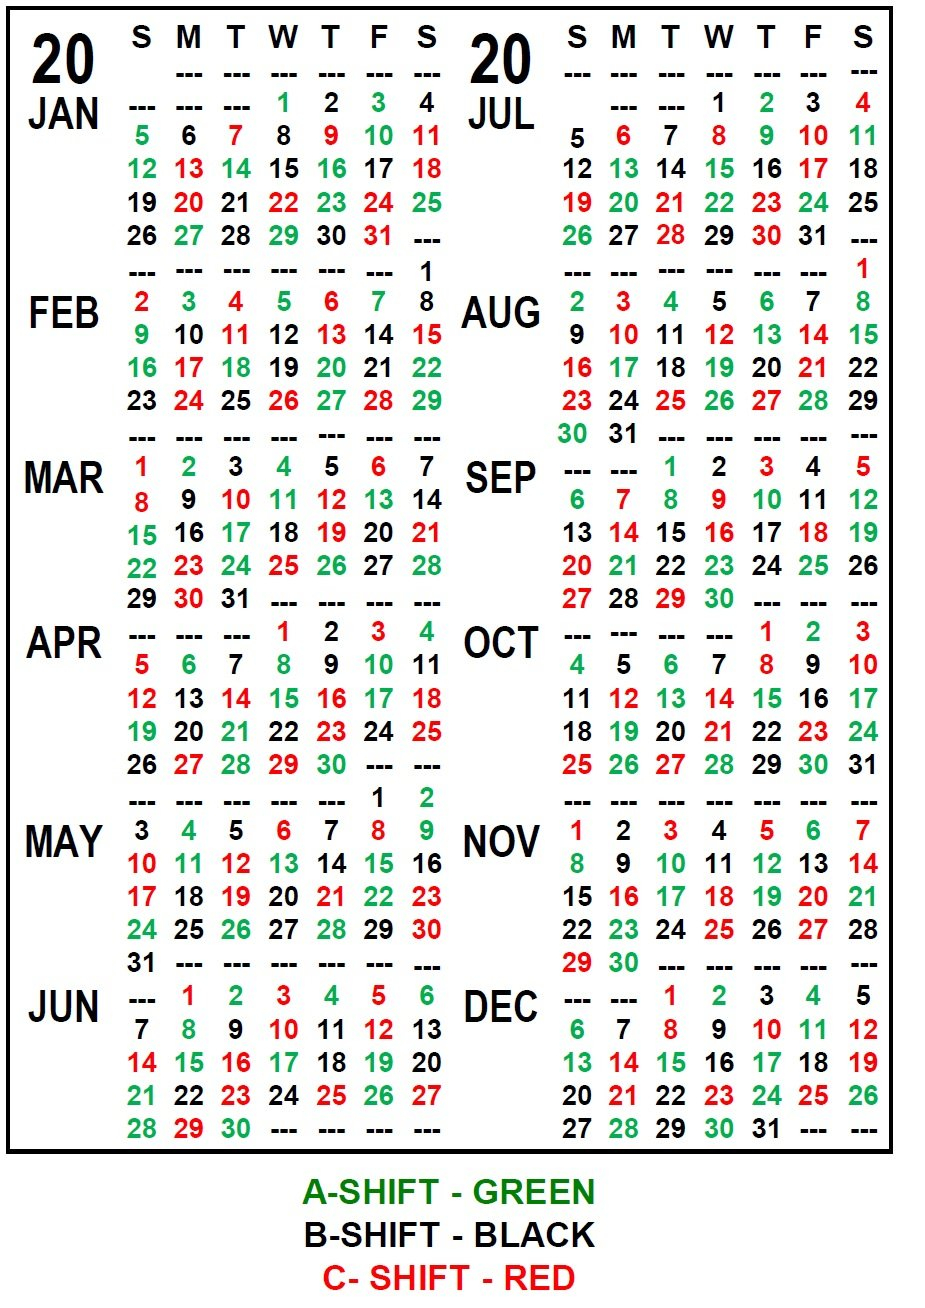 Collect Printable Firefighter Shift Calendar | Calendar Firefighter Shift Schedule Tool